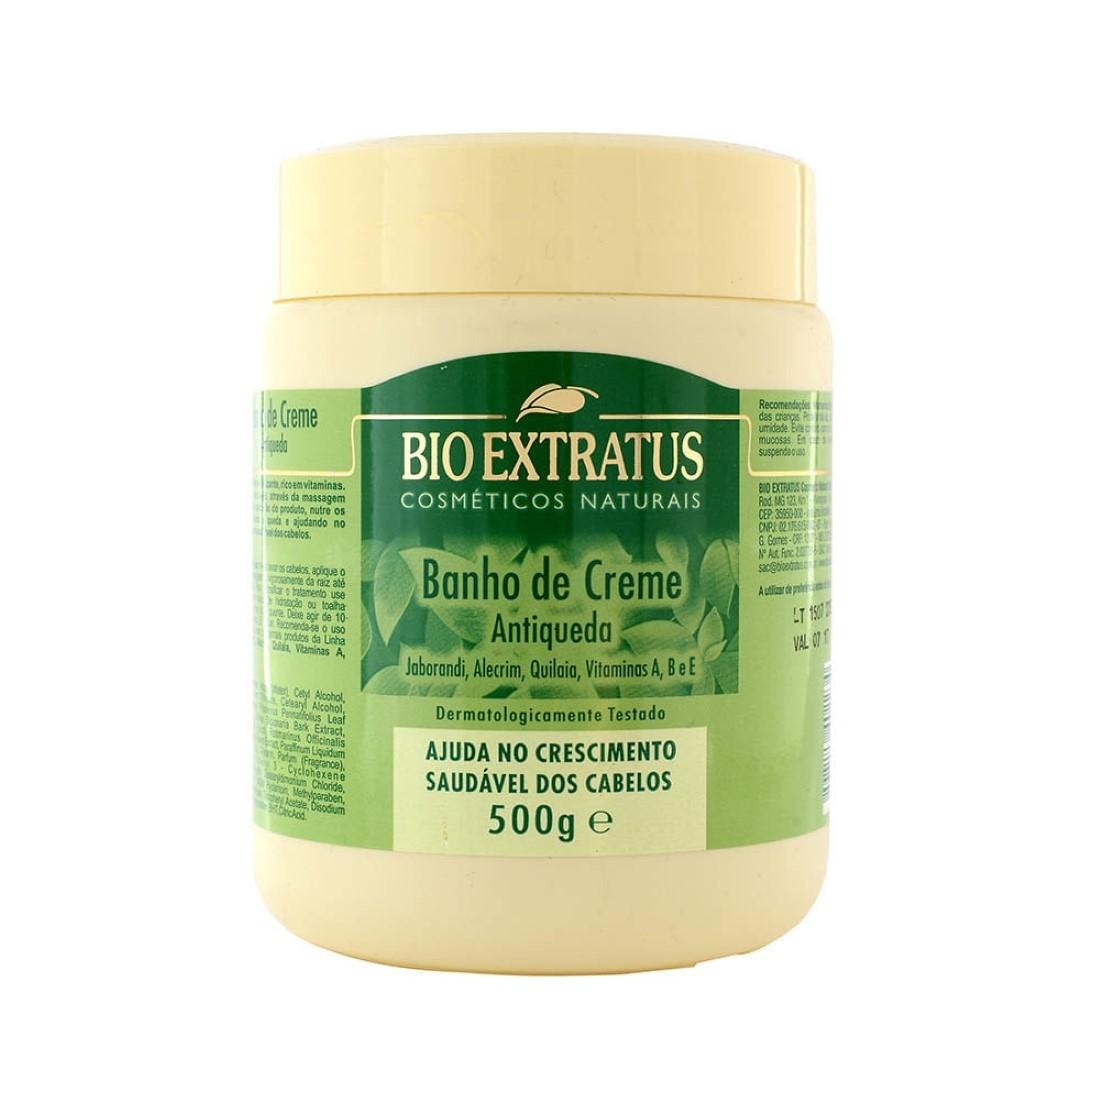 Banho de Creme Antiqueda 500g - Bio Extratus